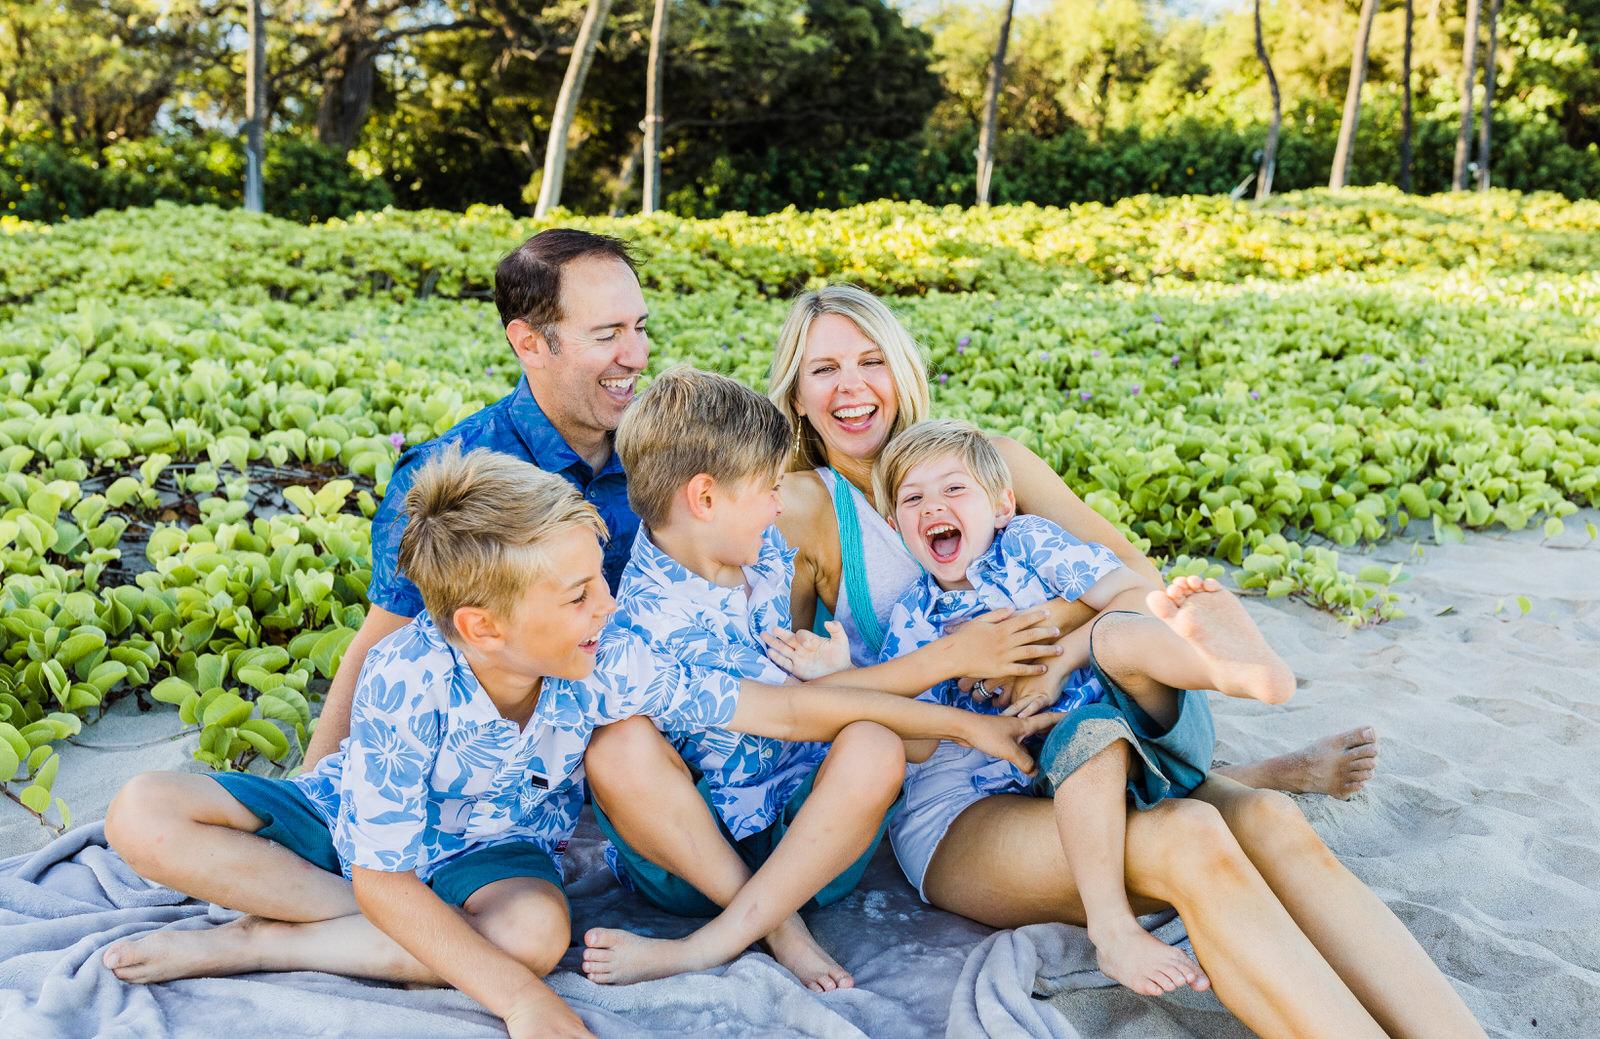 big-island-photographer-family-session-mauna-kea-resort-summer-waikoloa-sunrise-4087.jpg